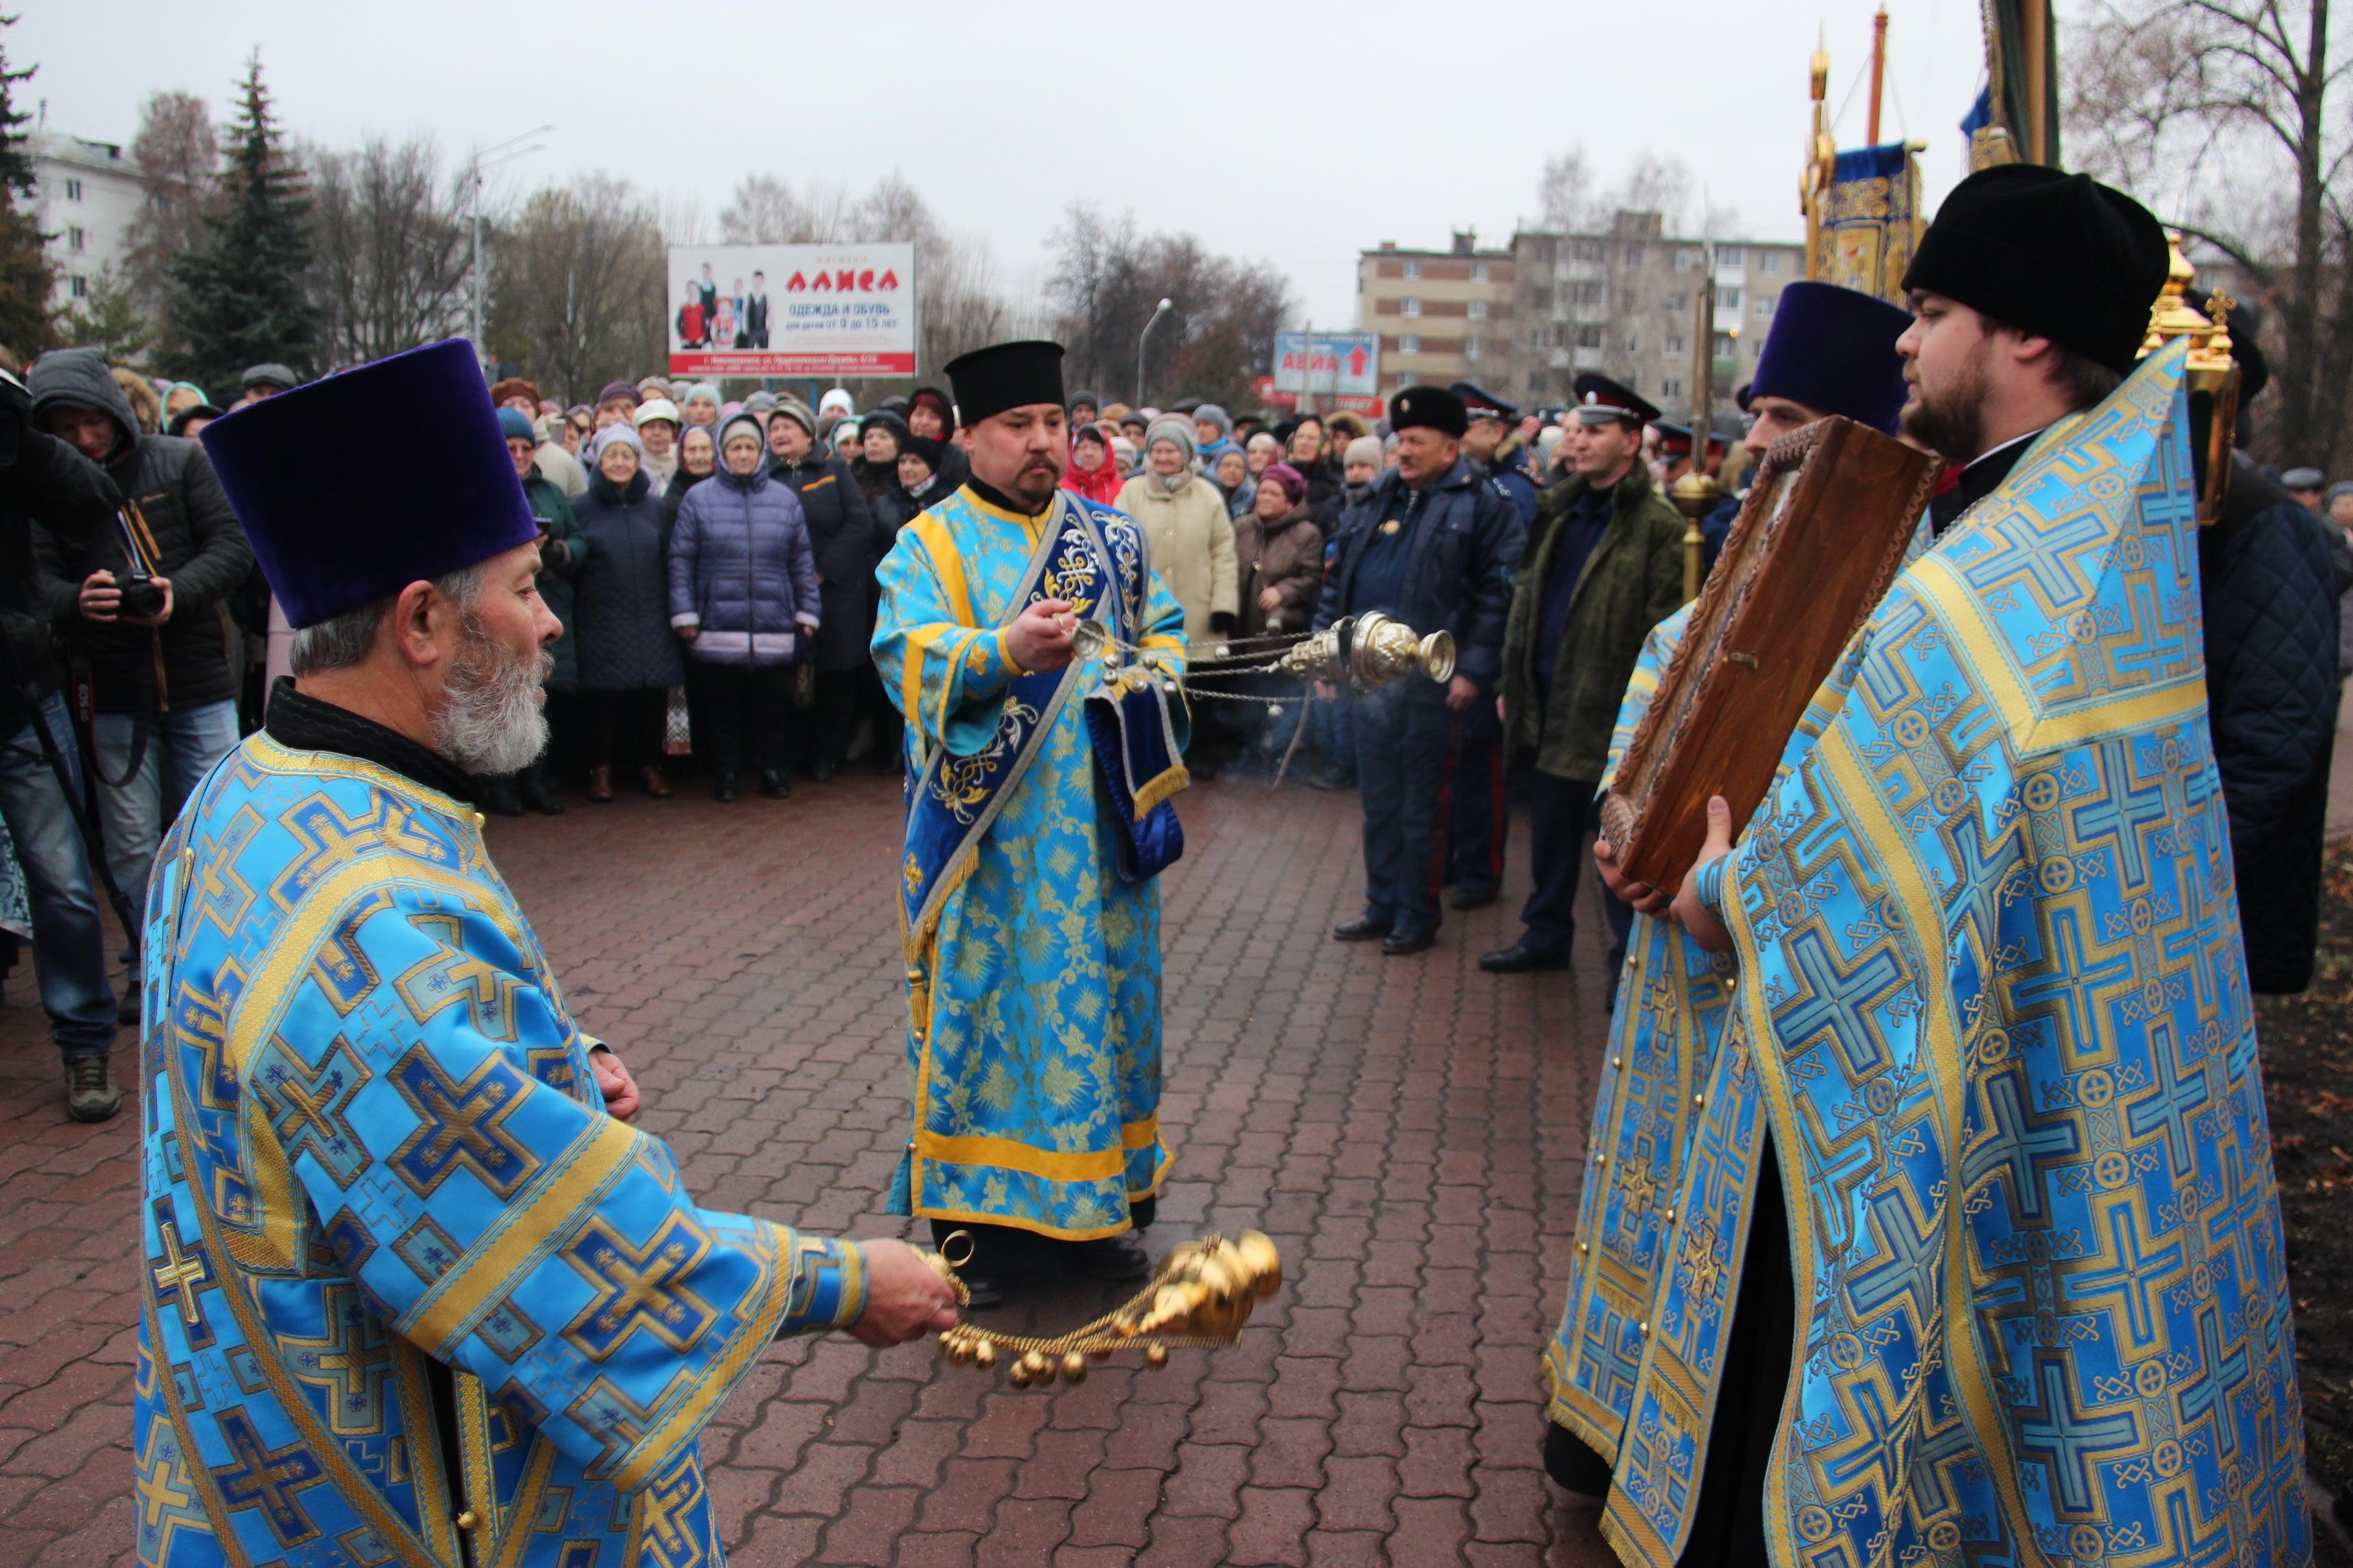 http://monuspen.ru/photoreports/e885ad143ffeae12541ceee7e7725b2i.JPG